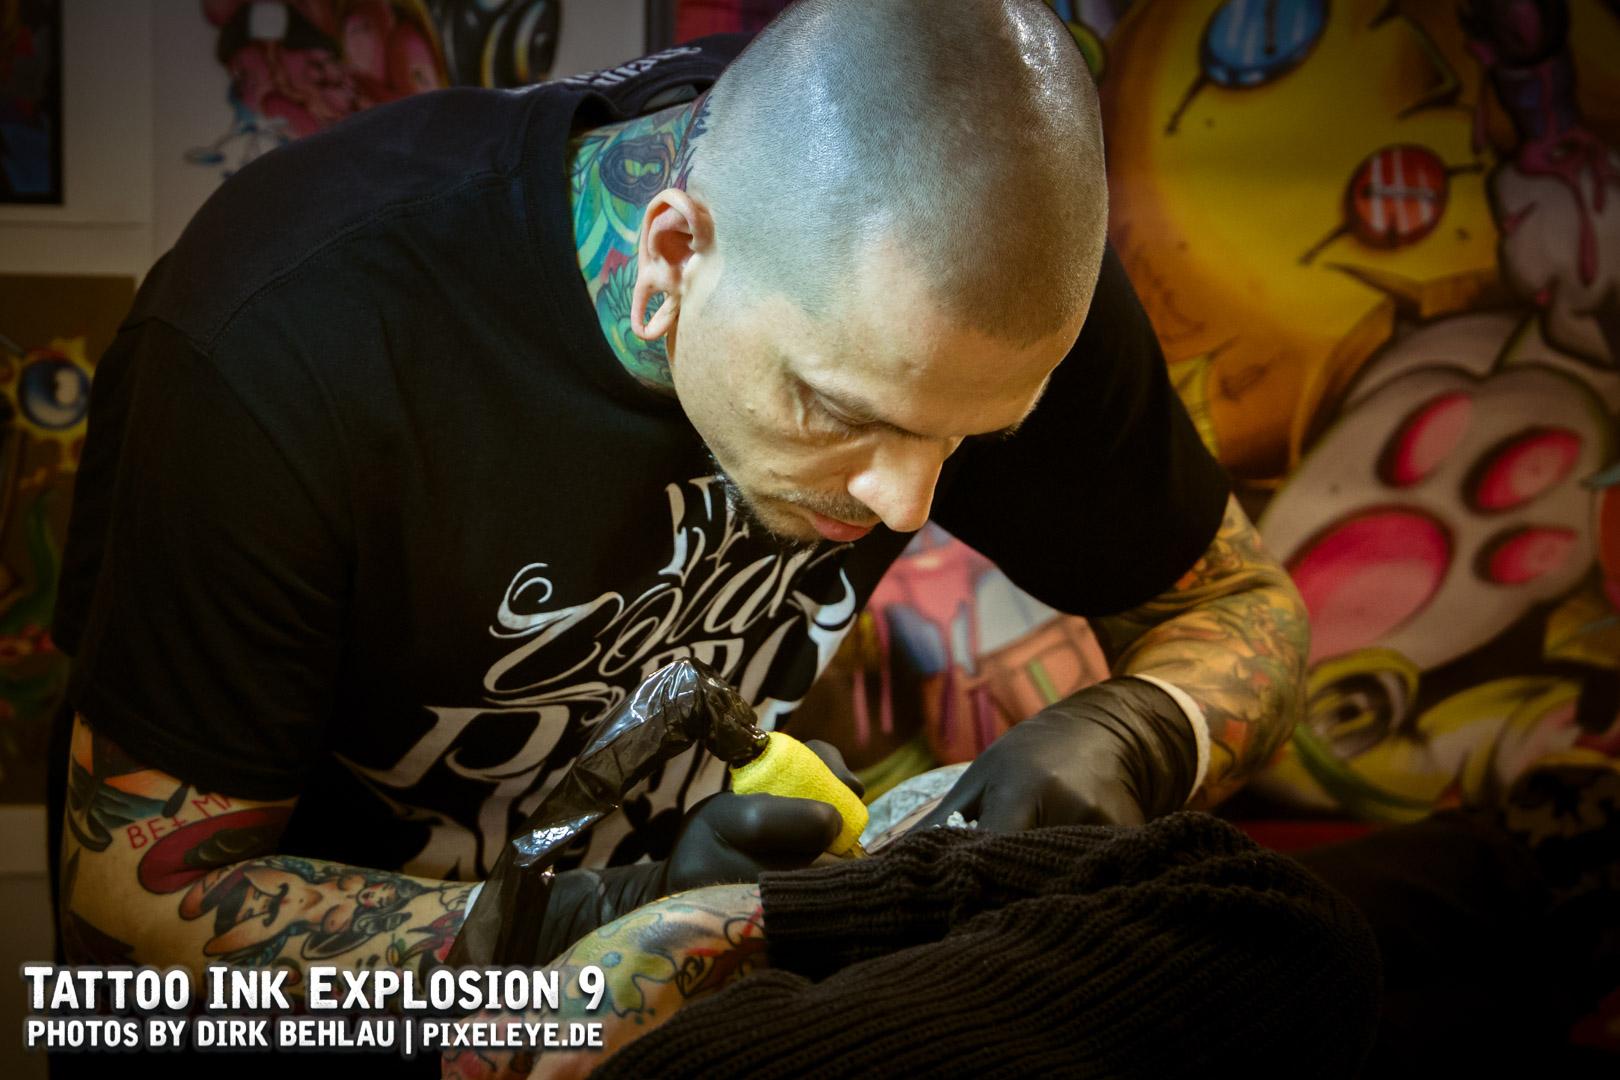 Tattoo Ink Explosion 2018 WEB by Dirk Behlau-0312.jpg